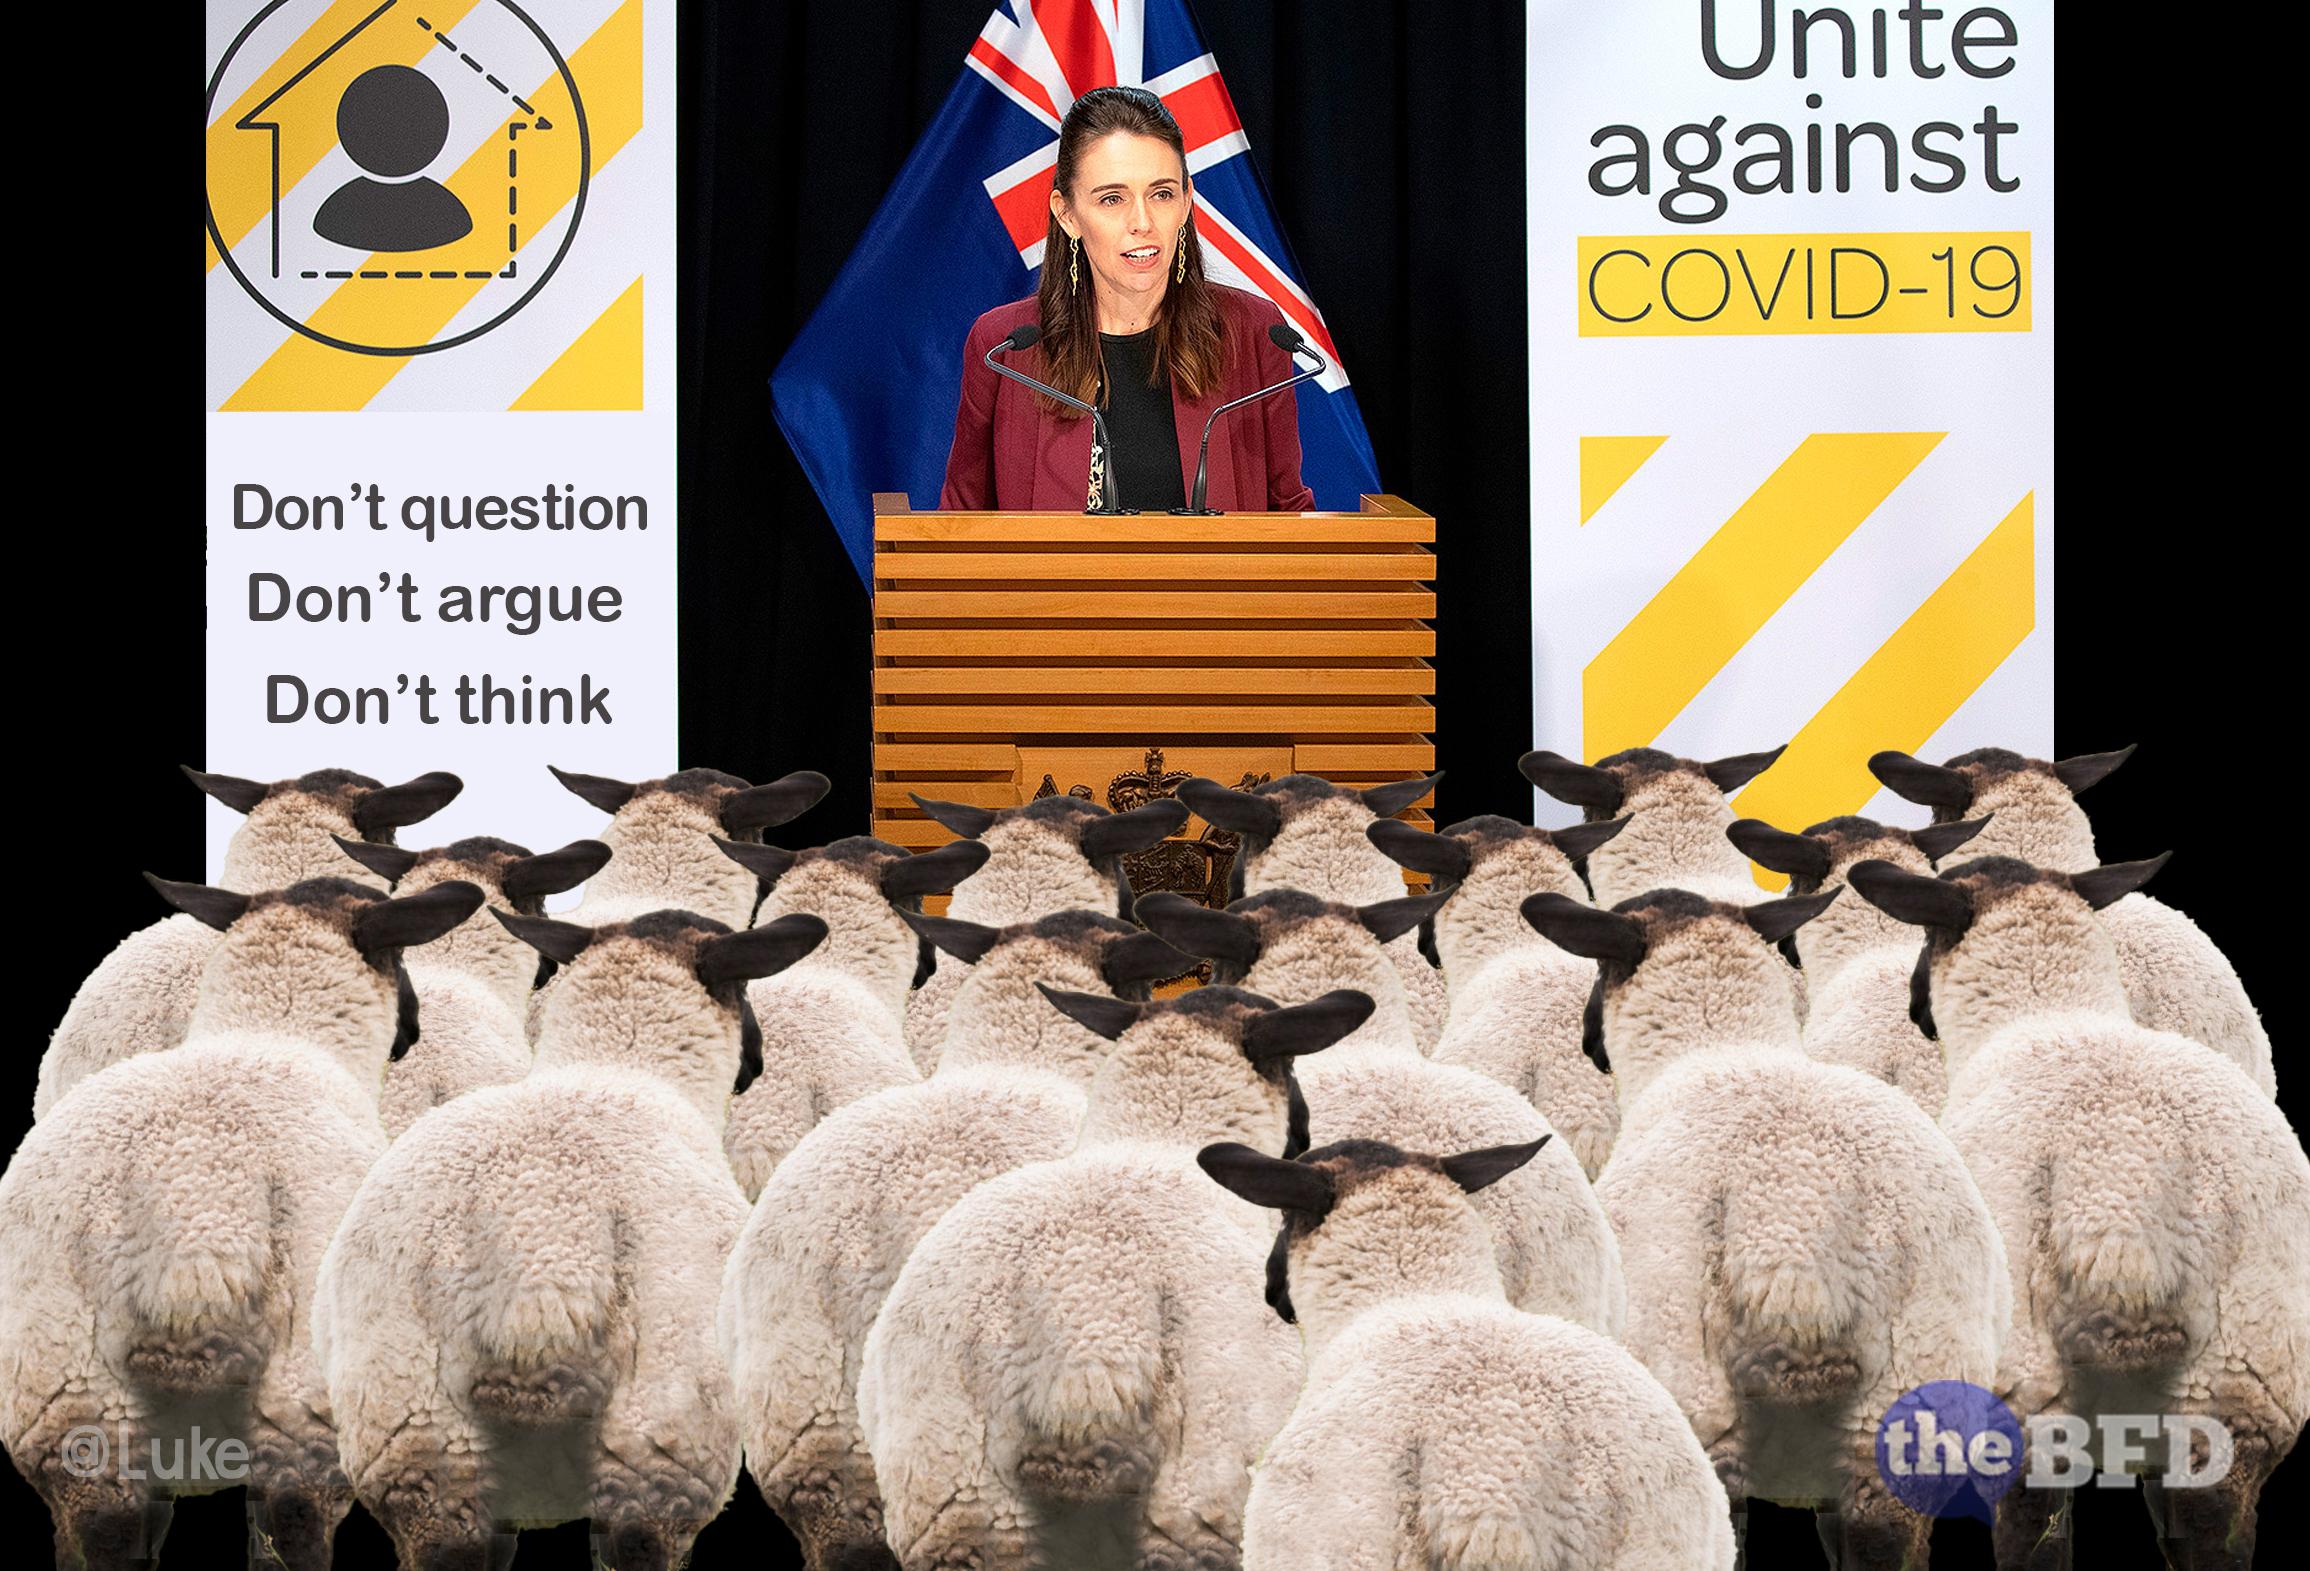 Jacinda Put New Zealanders' Health and Wellbeing Second